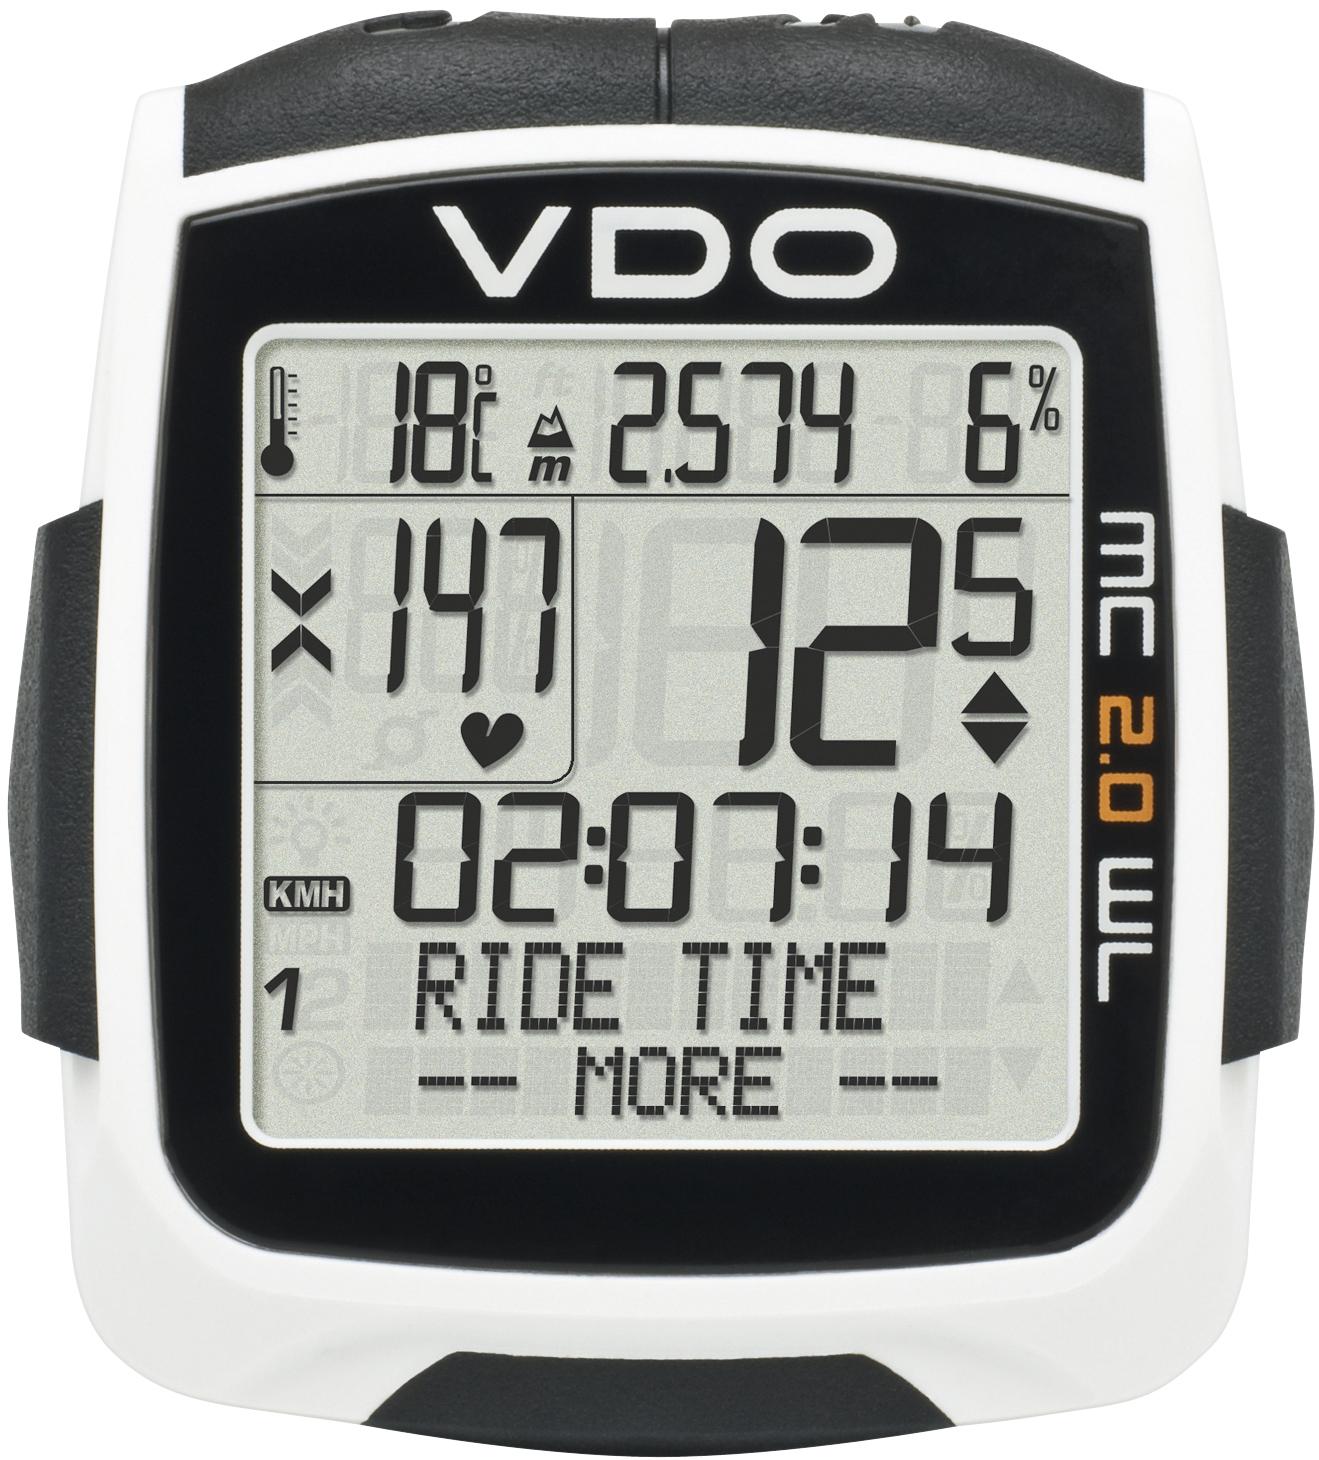 Vdo Mc 2 0 Wl Wireless Cycling Computer